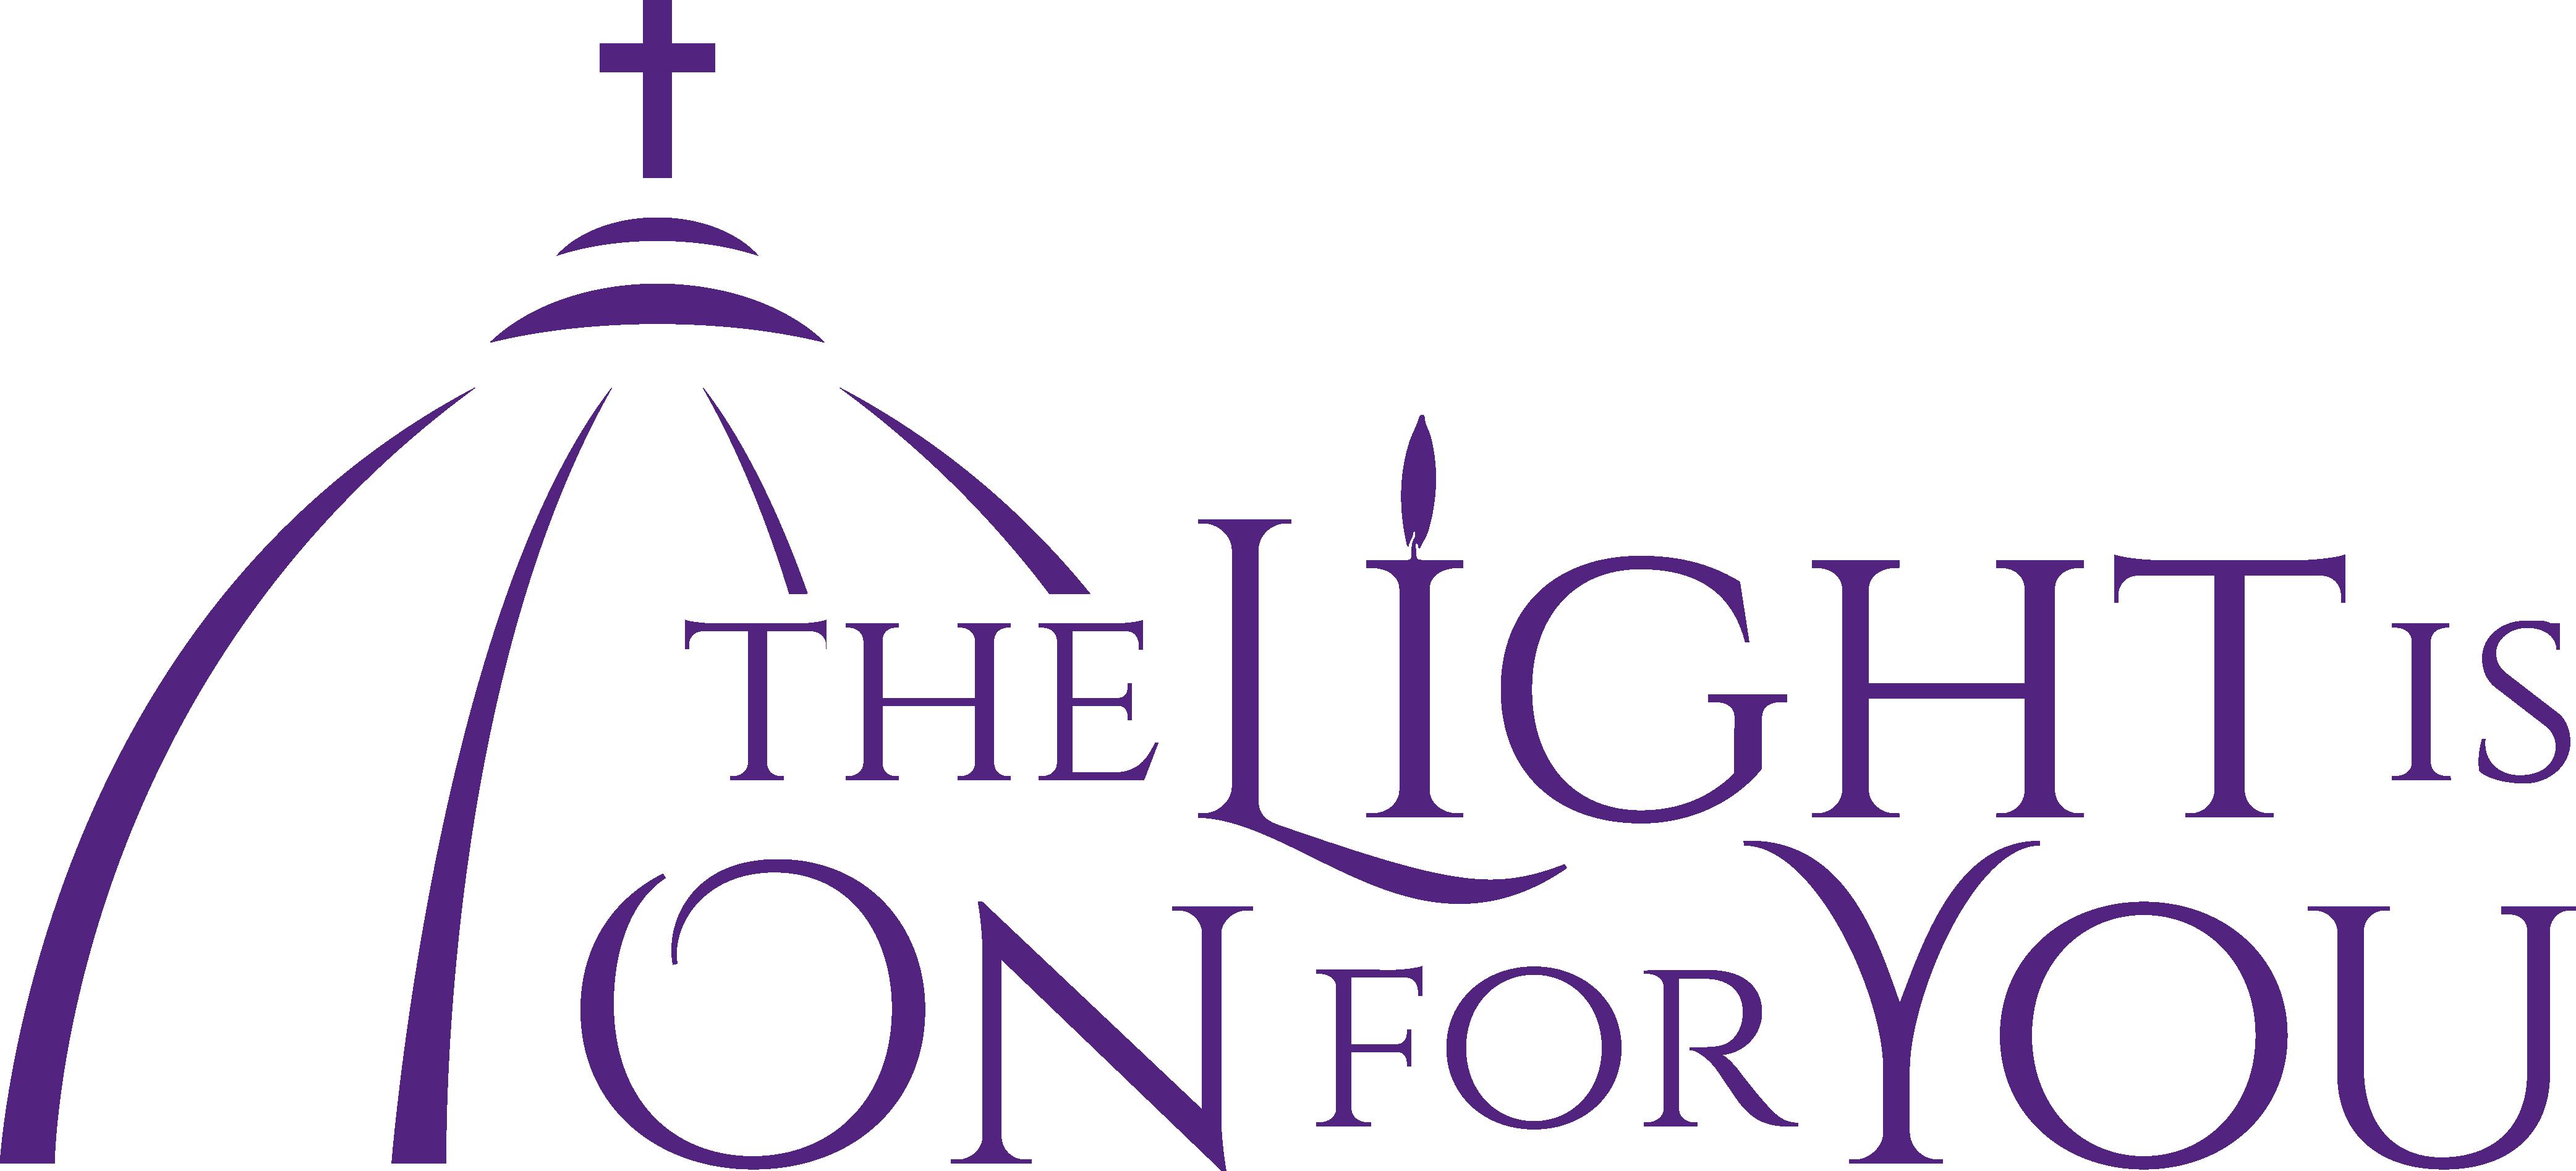 Lent clipart catholic, Lent catholic Transparent FREE for download.